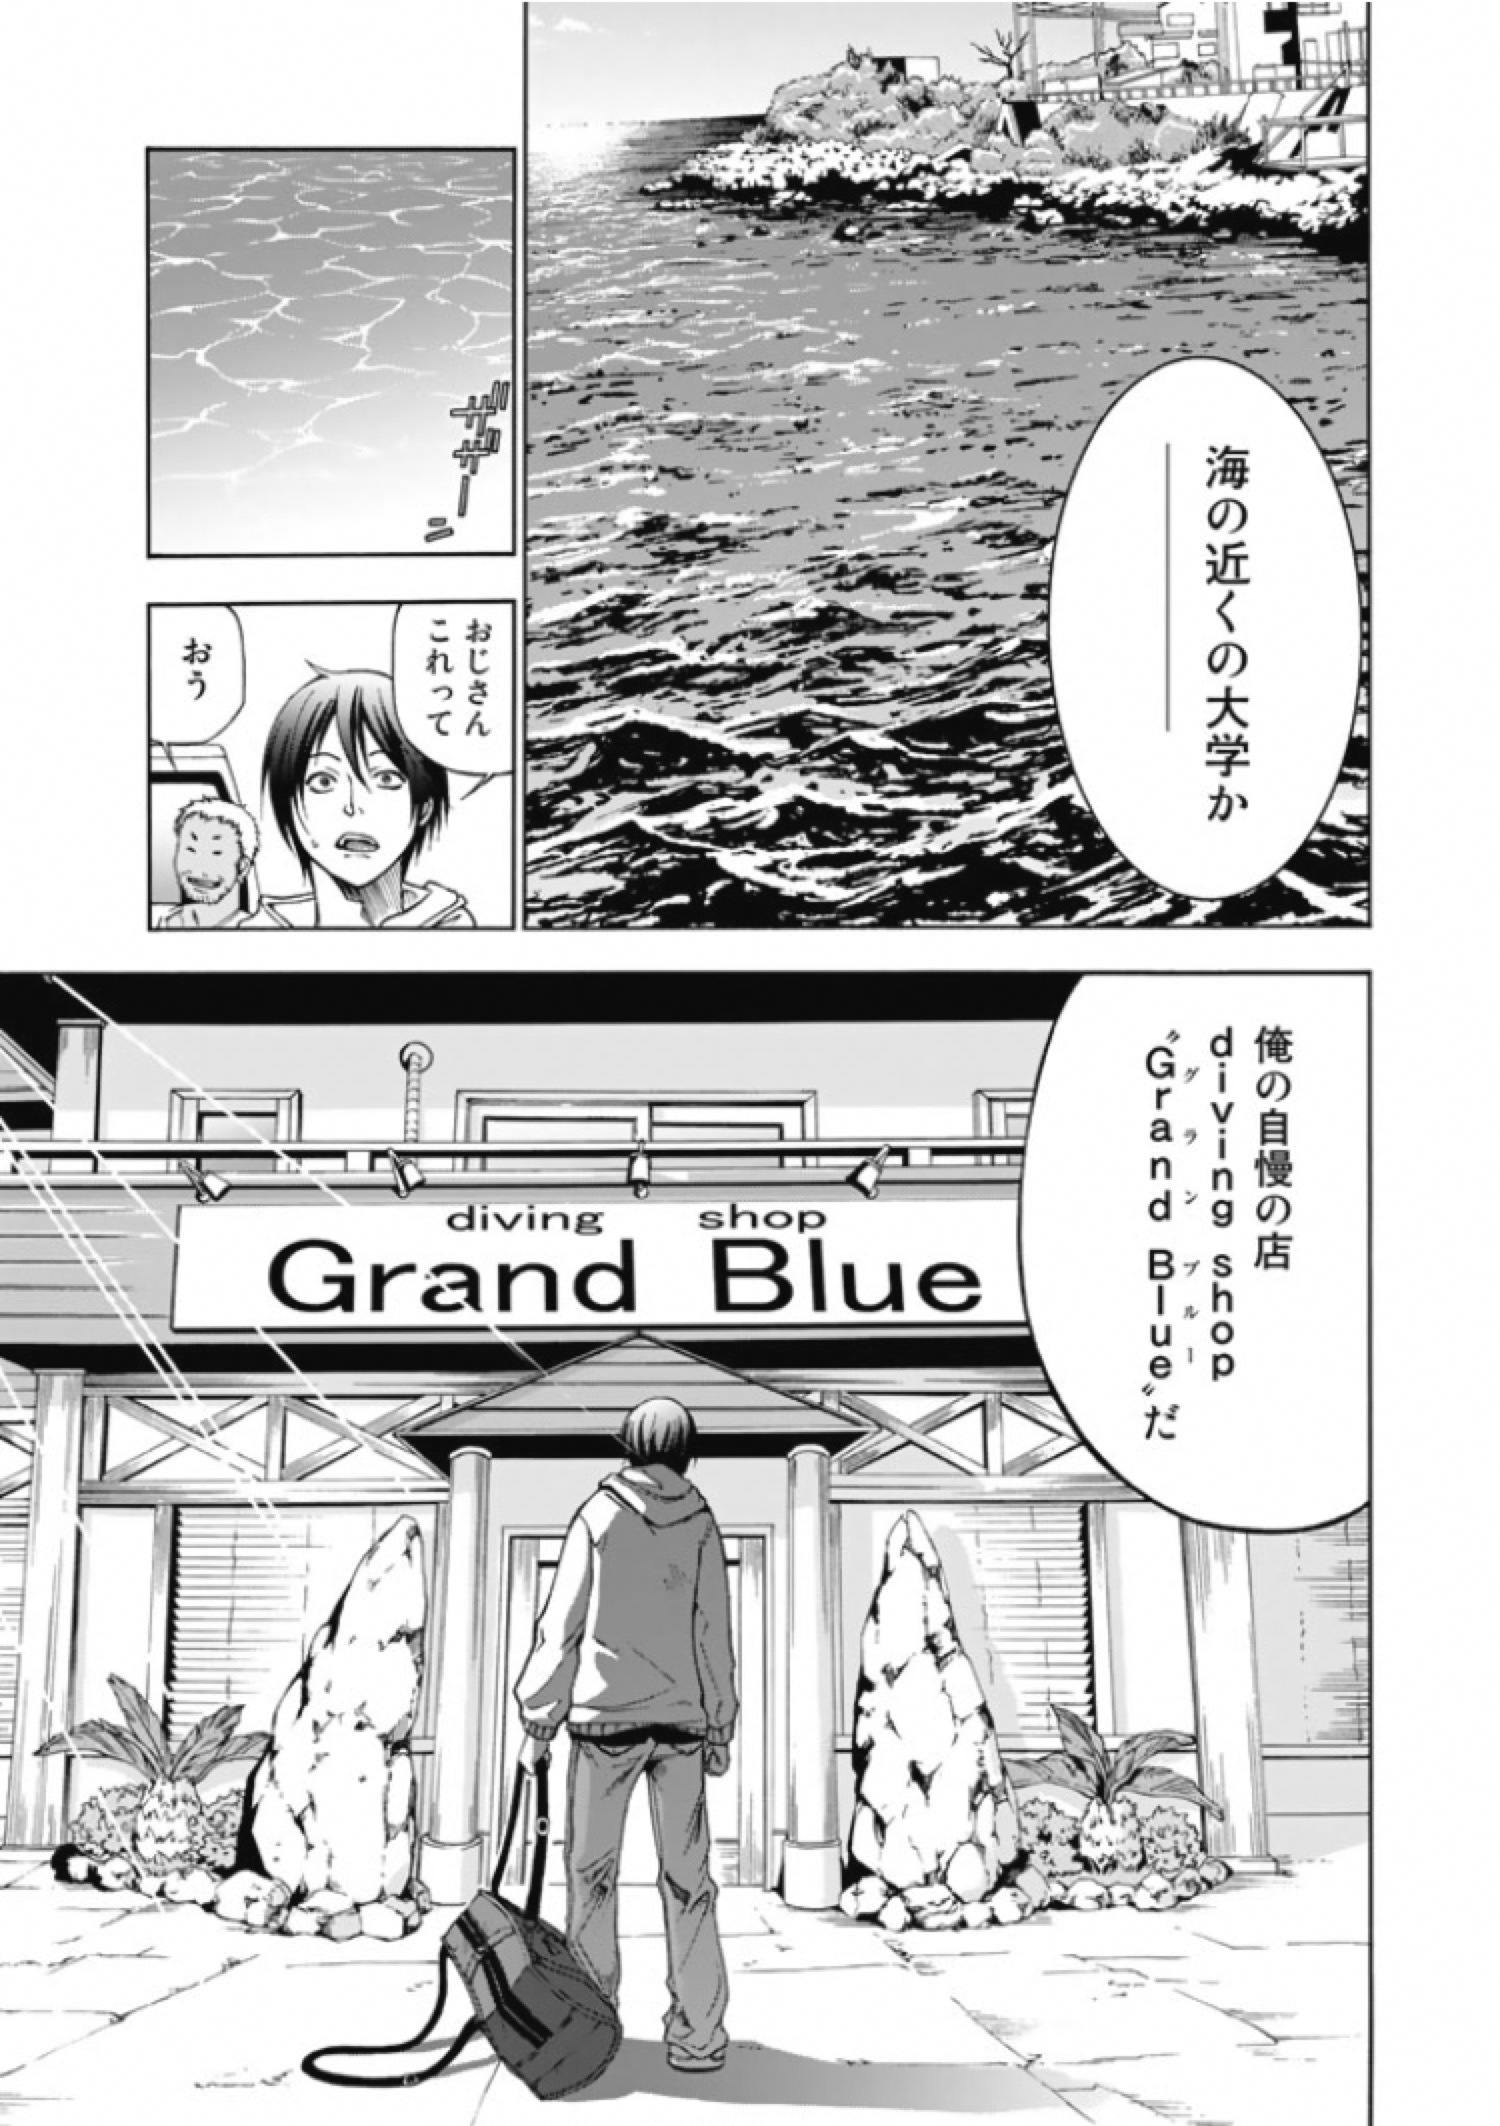 Granblue7